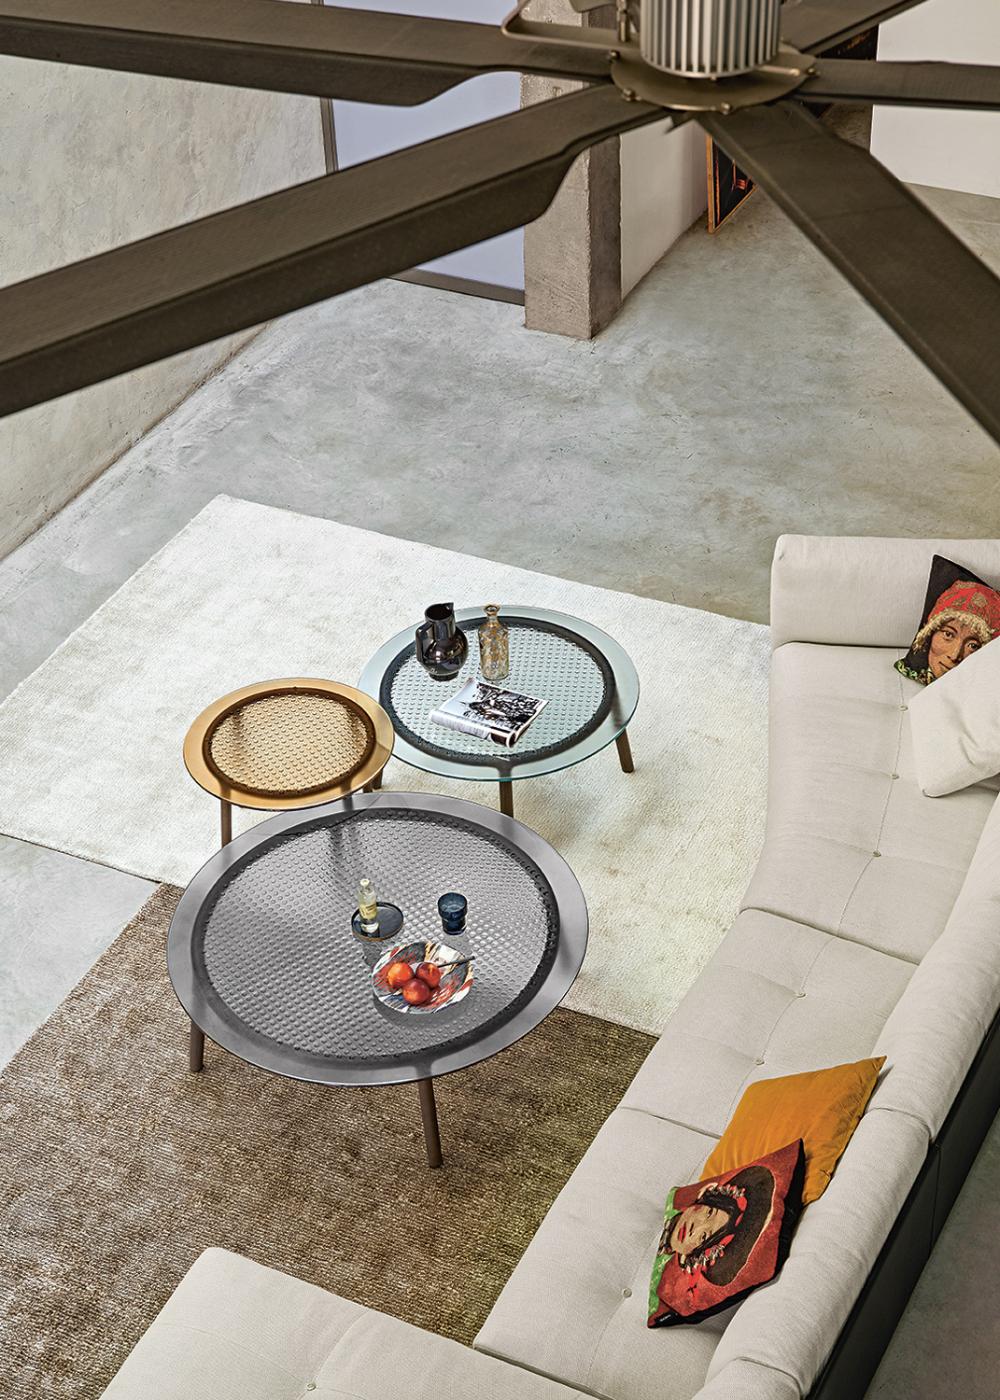 Elegant Cannage Coffee Table Italian Designer Luxury Furniture By Cassoni Luxury Italian Furniture Coffee Table Design Luxury Furniture Brands [ 1400 x 1000 Pixel ]